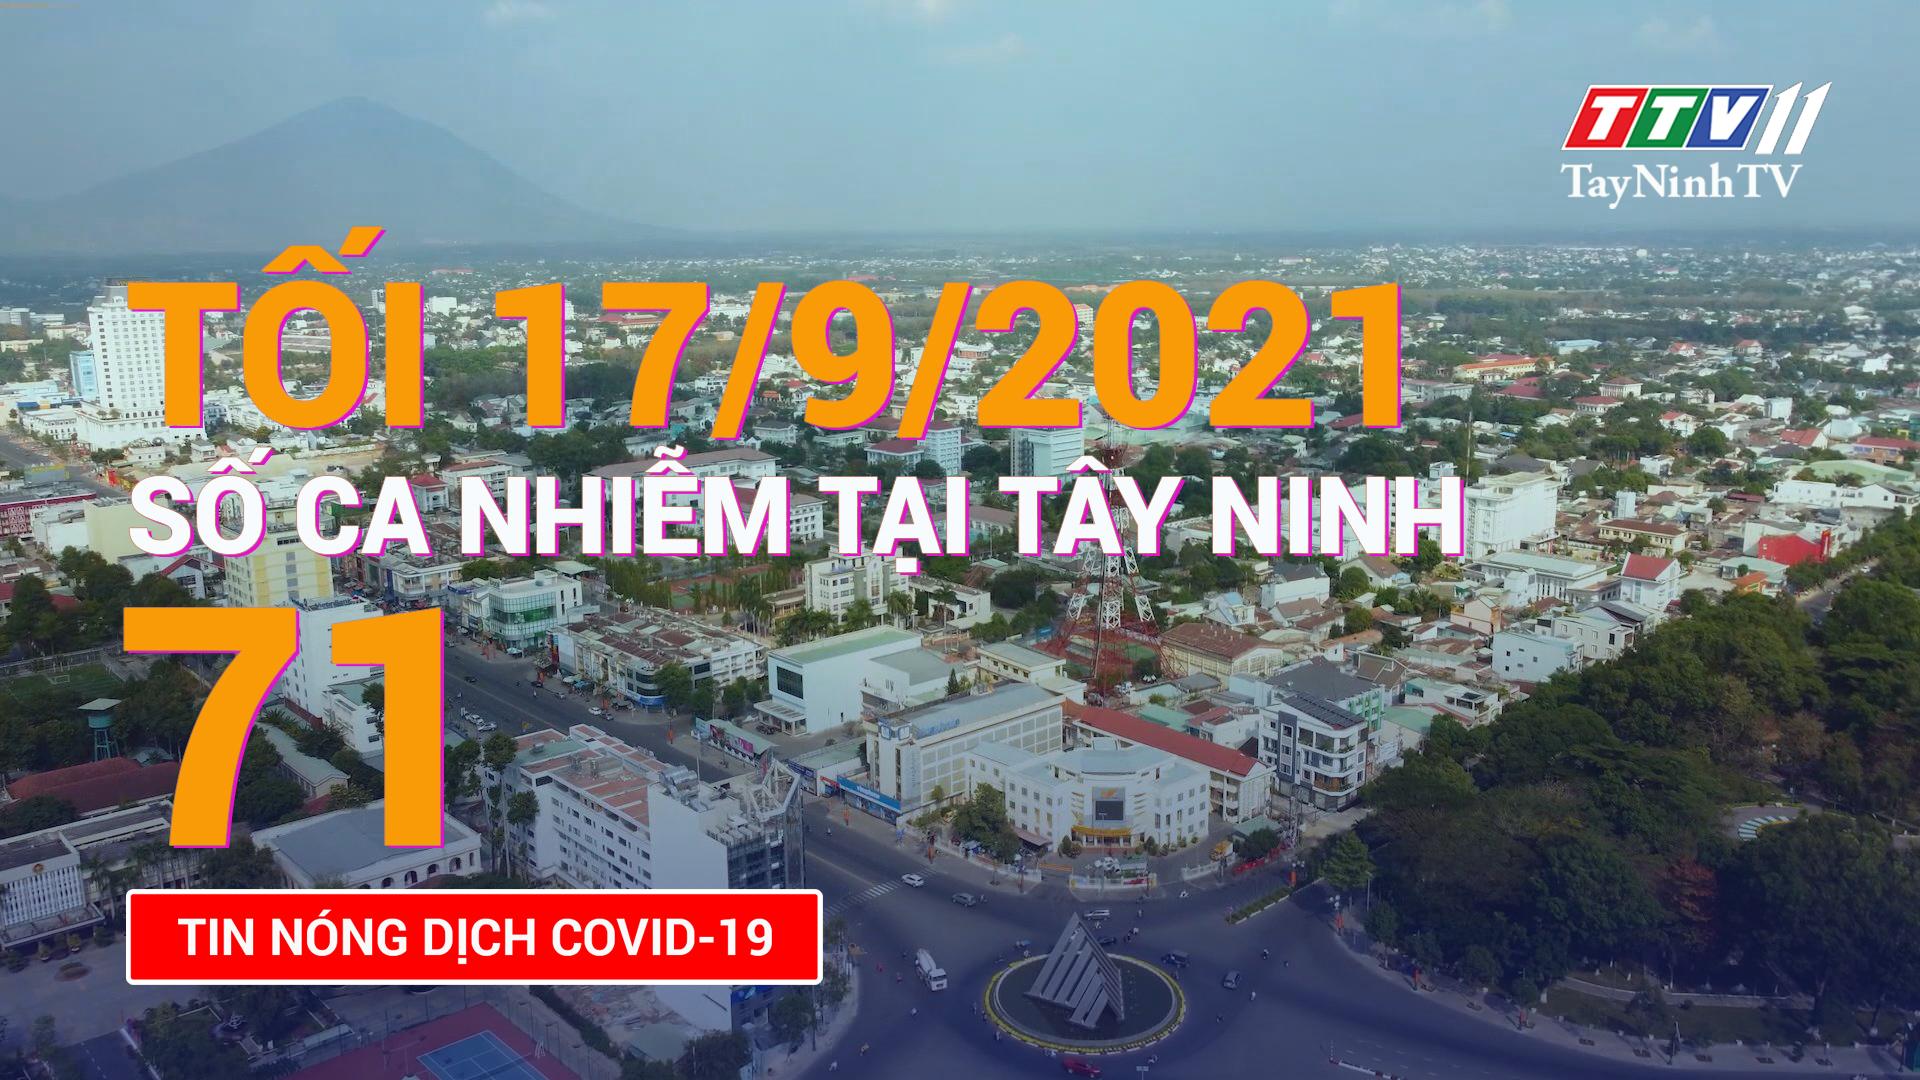 Tin tức Covid-19 tối 17/9/2021 | TayNinhTV